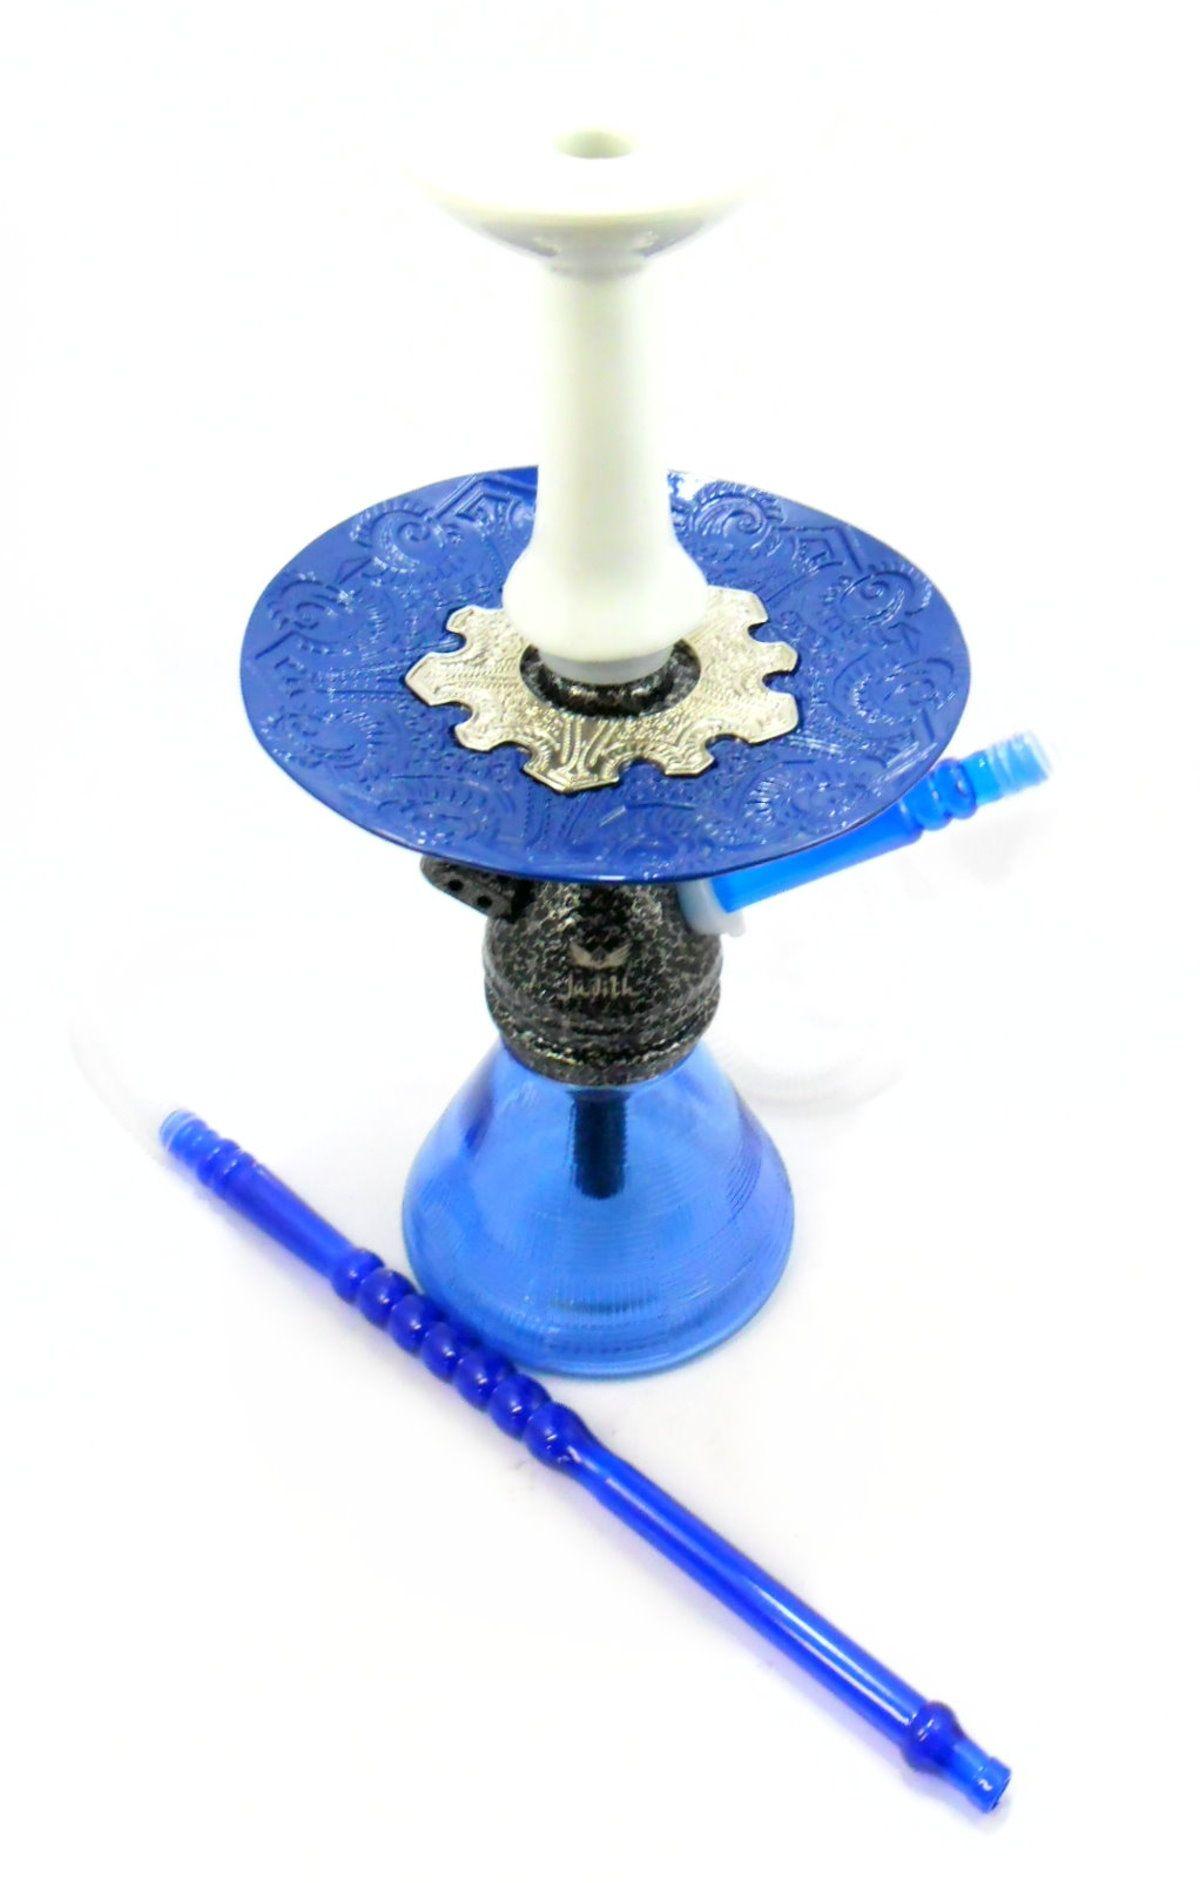 Narguile JUDITH PRETO MARTELADO 33cm, vaso Petit AZUL, mangueira MD HOSE, fornilho Flux BRANCO prato Vennus Azul/Cromado